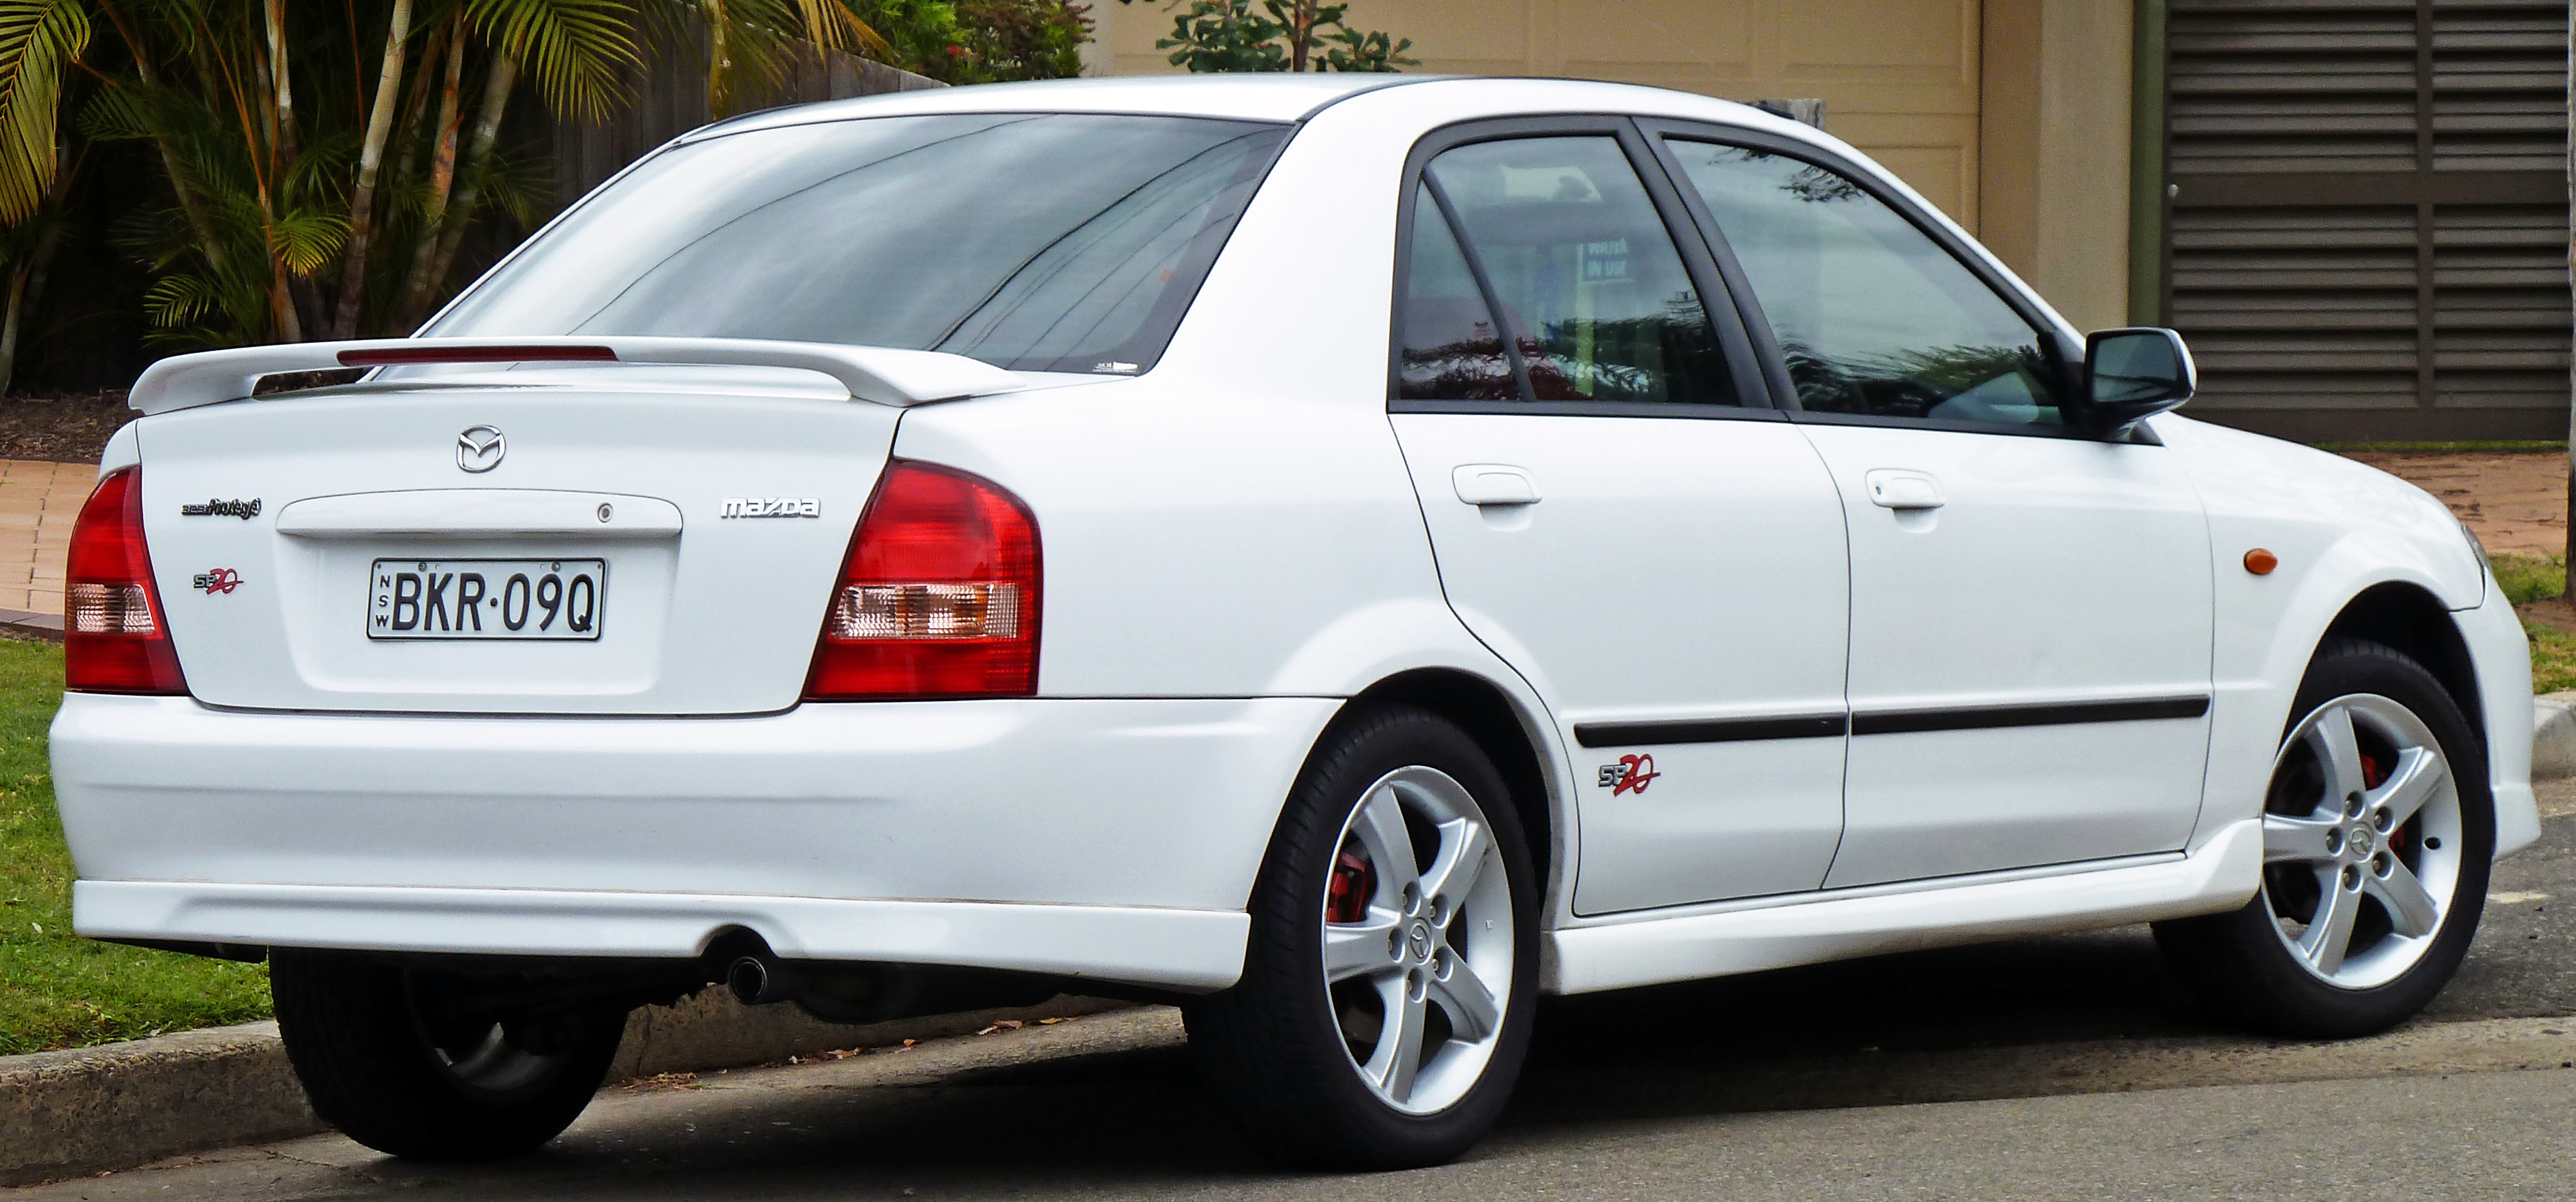 Mazda Protege III (BJ) 1998 - 2004 Sedan #1